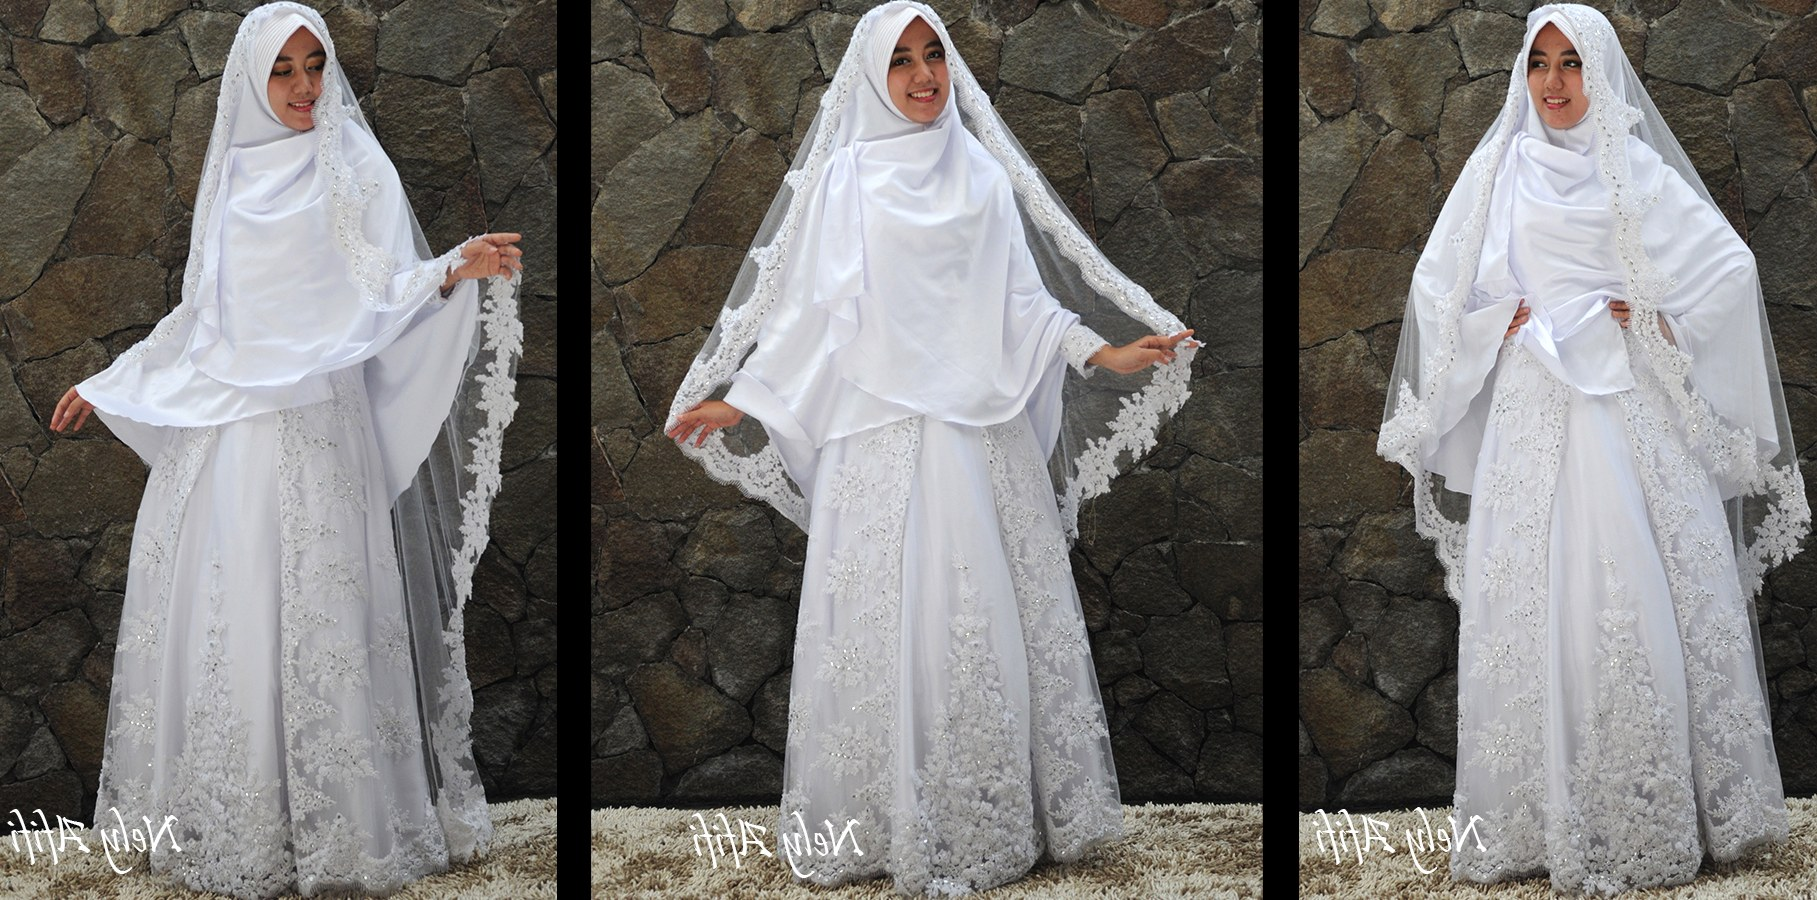 Ide Gaun Pengantin Muslimah Syar'i Bqdd Wear evening Dress In the Fice – Get Tips for Dressing